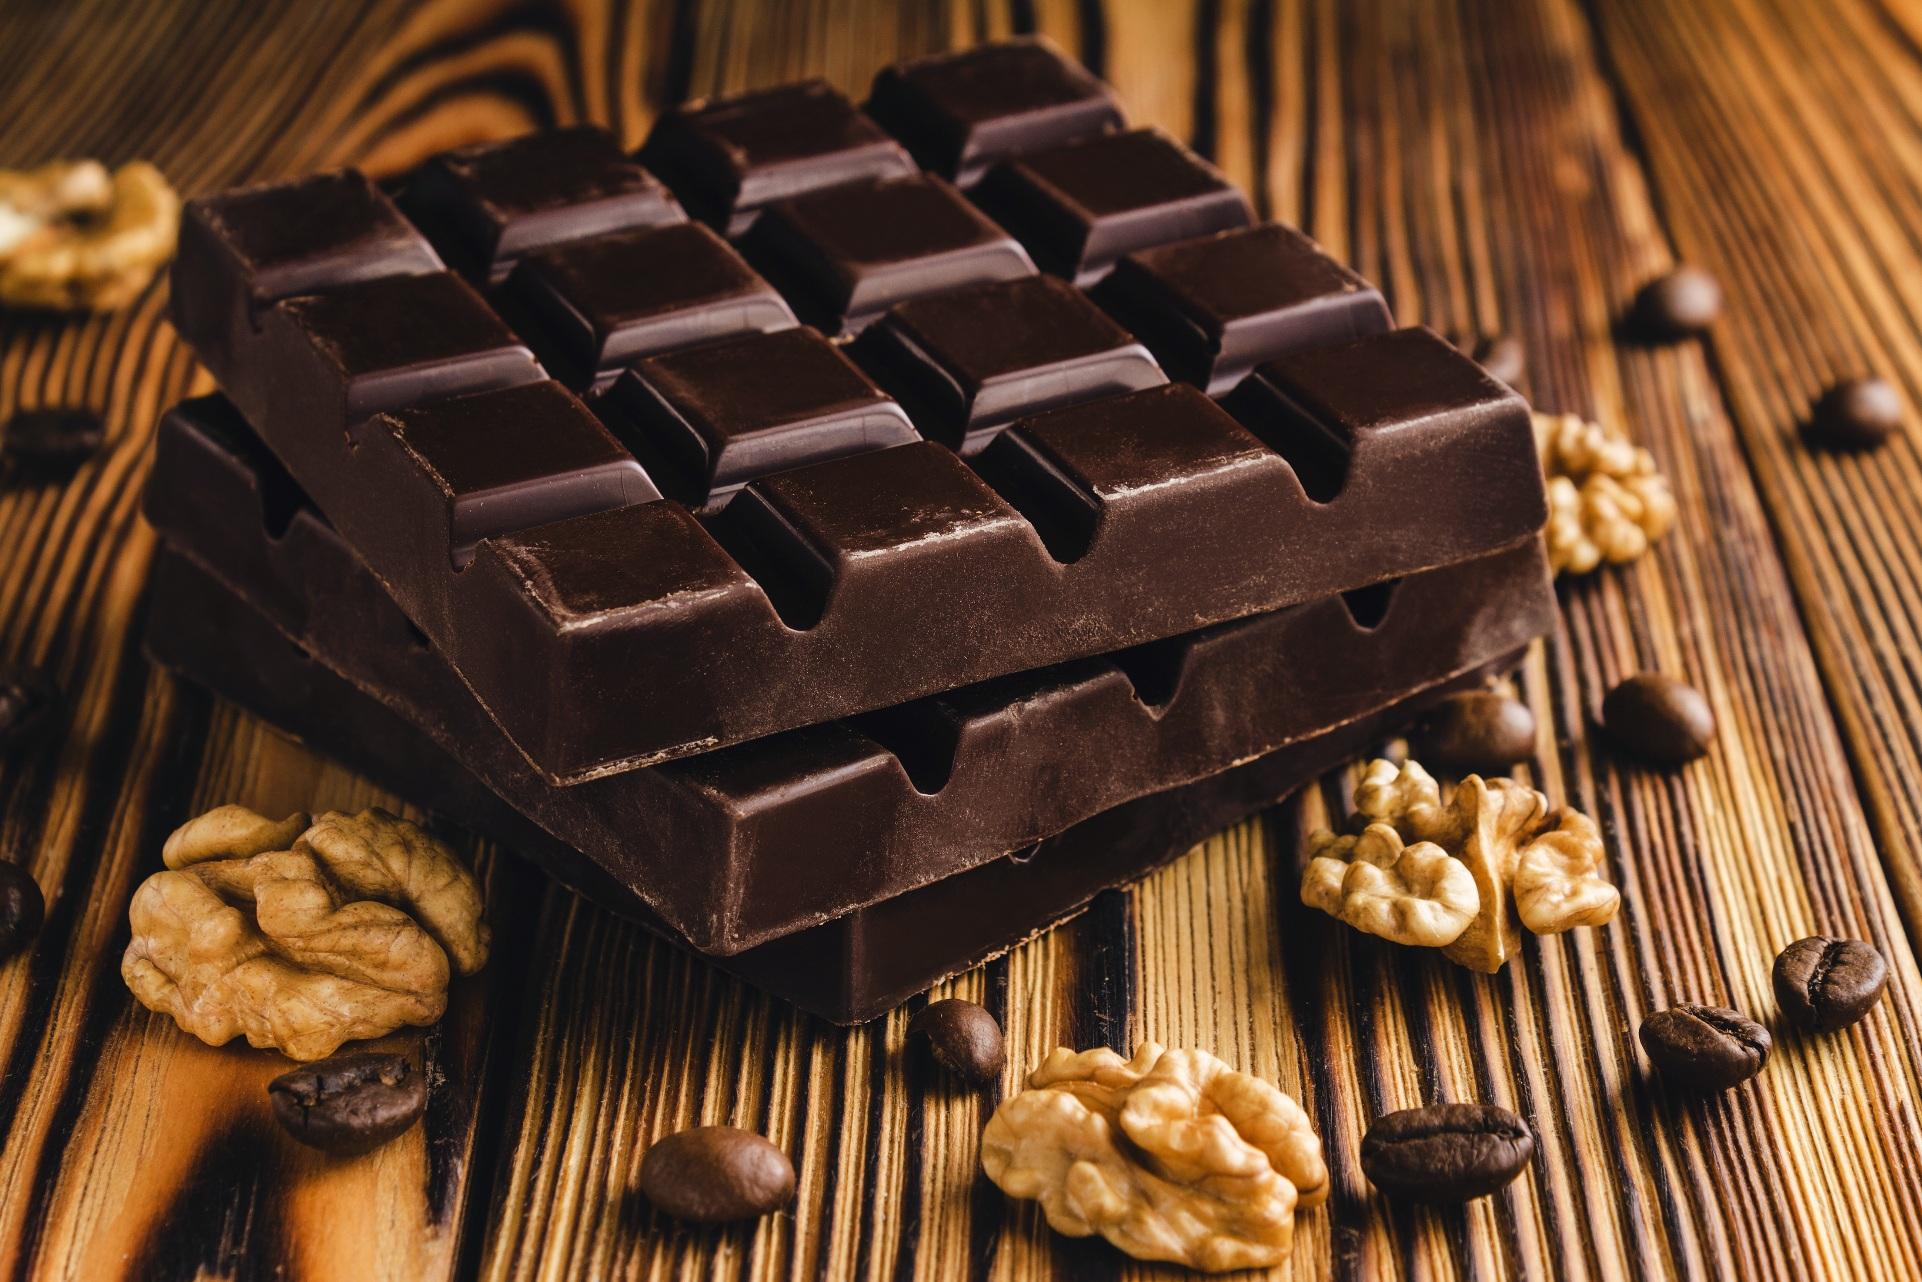 Finish - Hints of DarkChocolate & Coffee